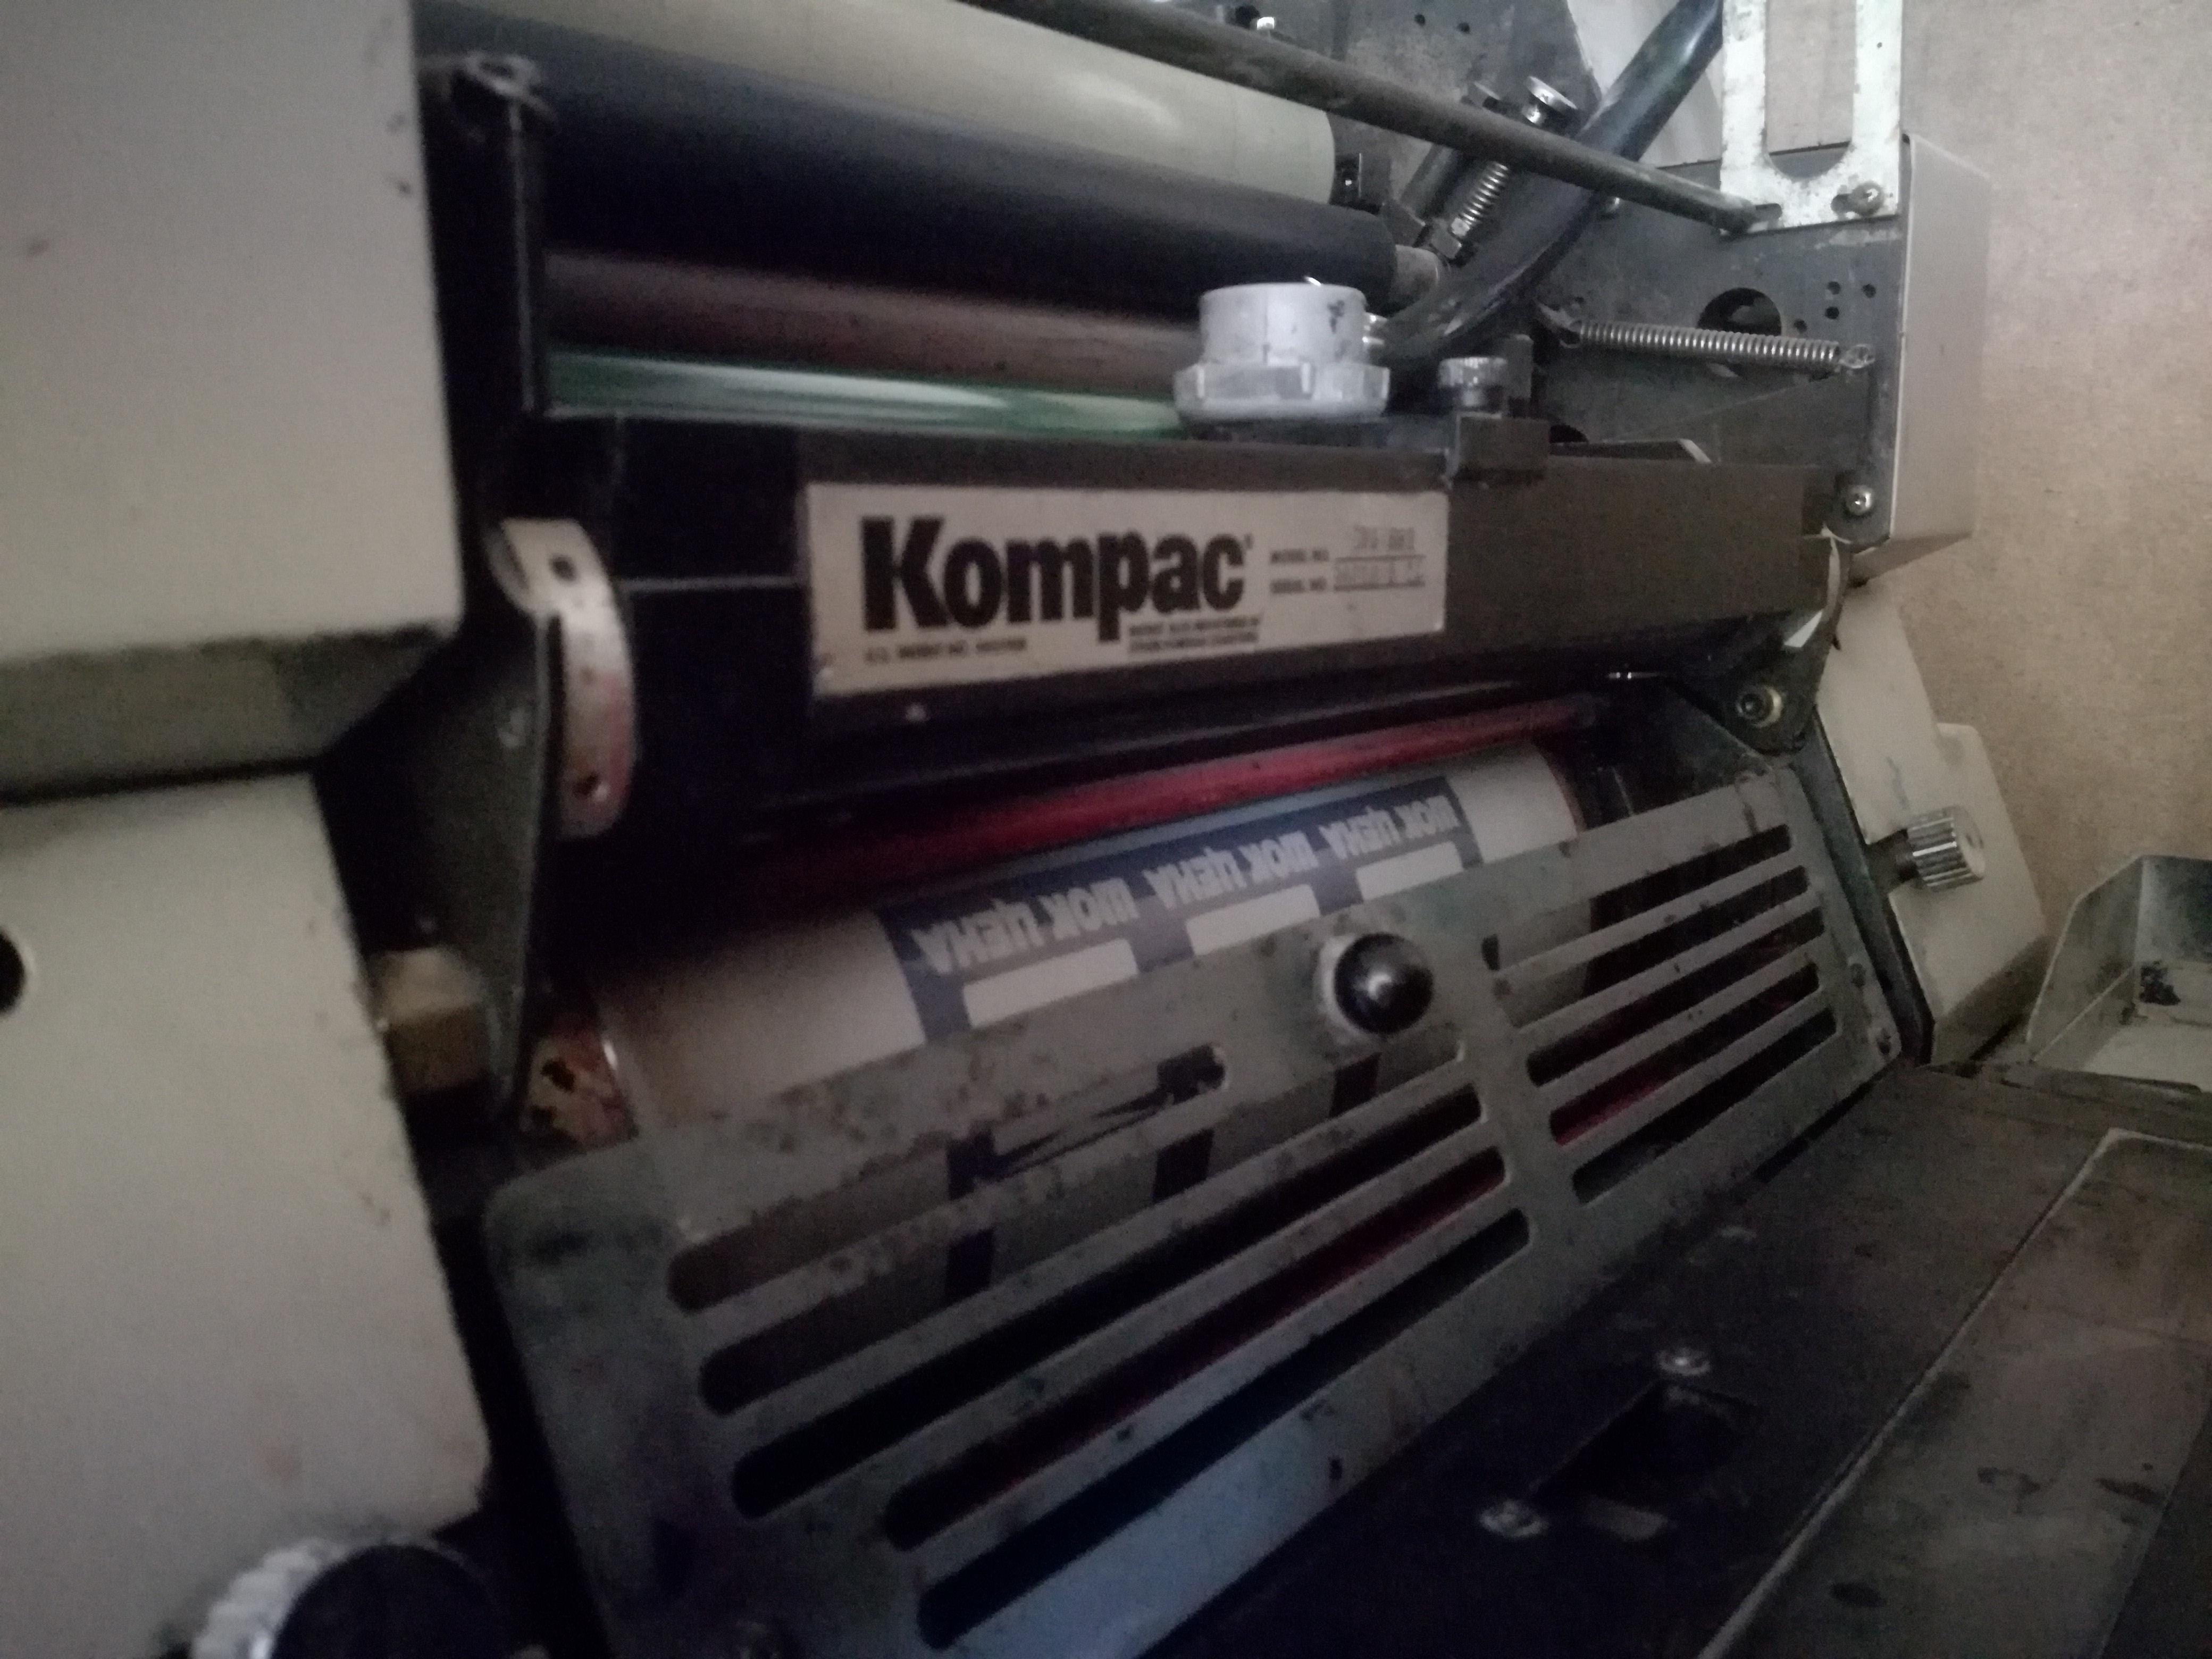 How to buy vintage audio equipment